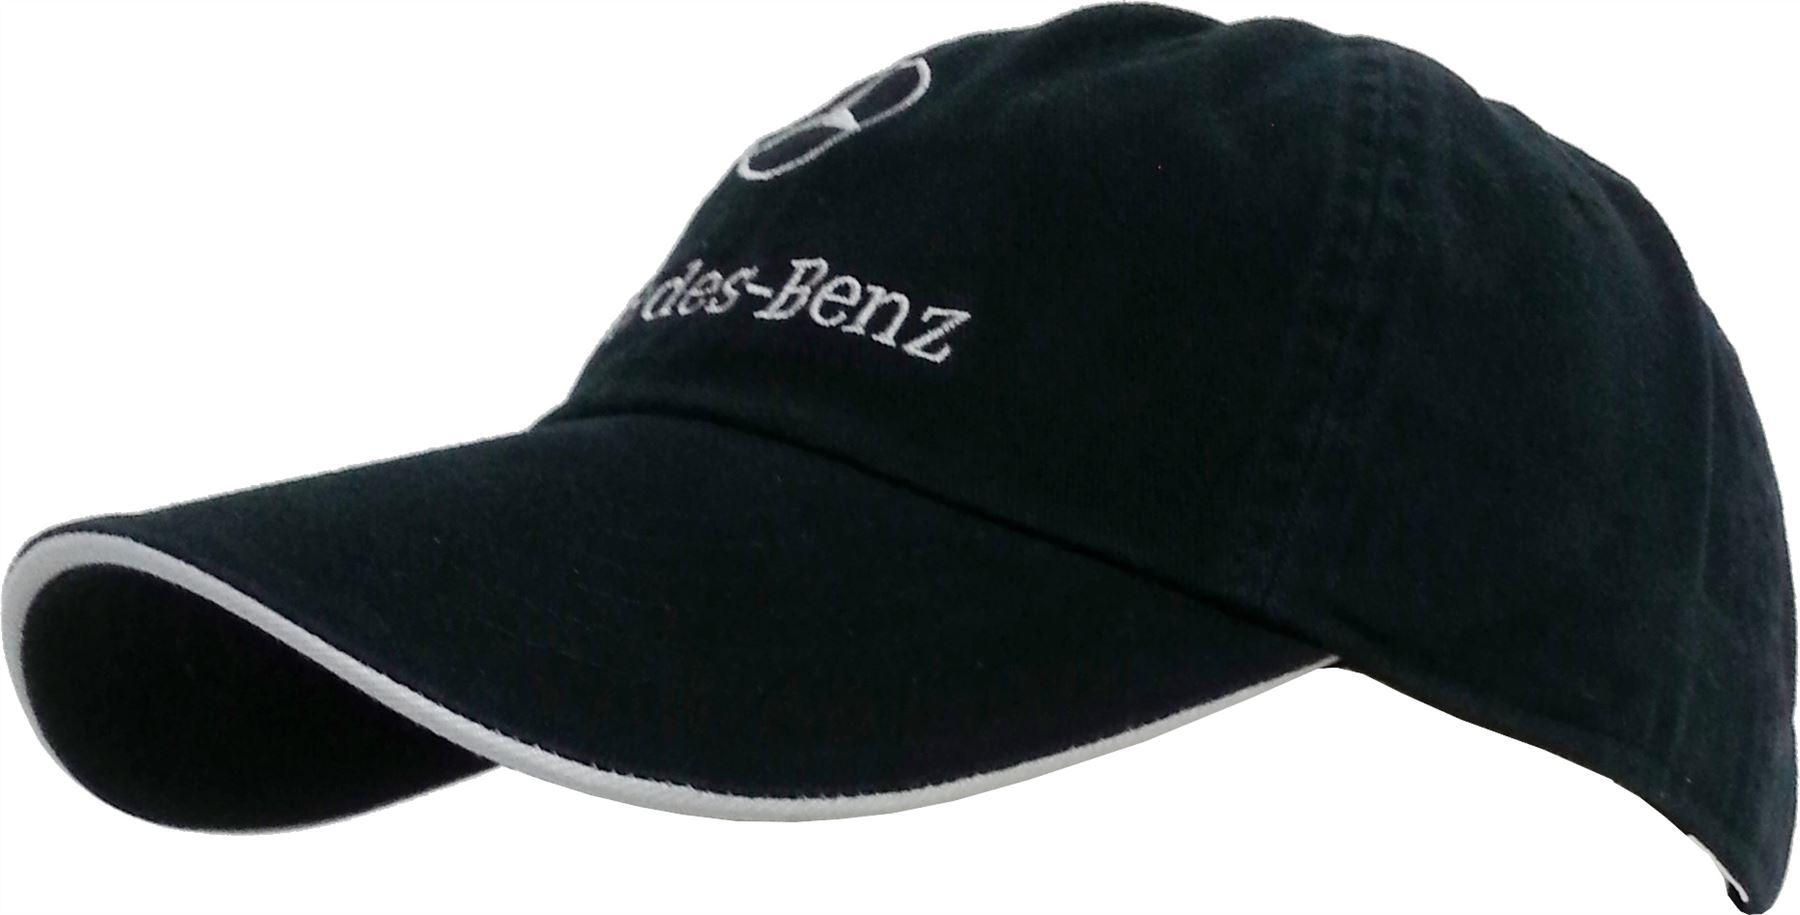 Mercedes benz black navy blue adult cotton mesh for Mercedes benz women s jacket